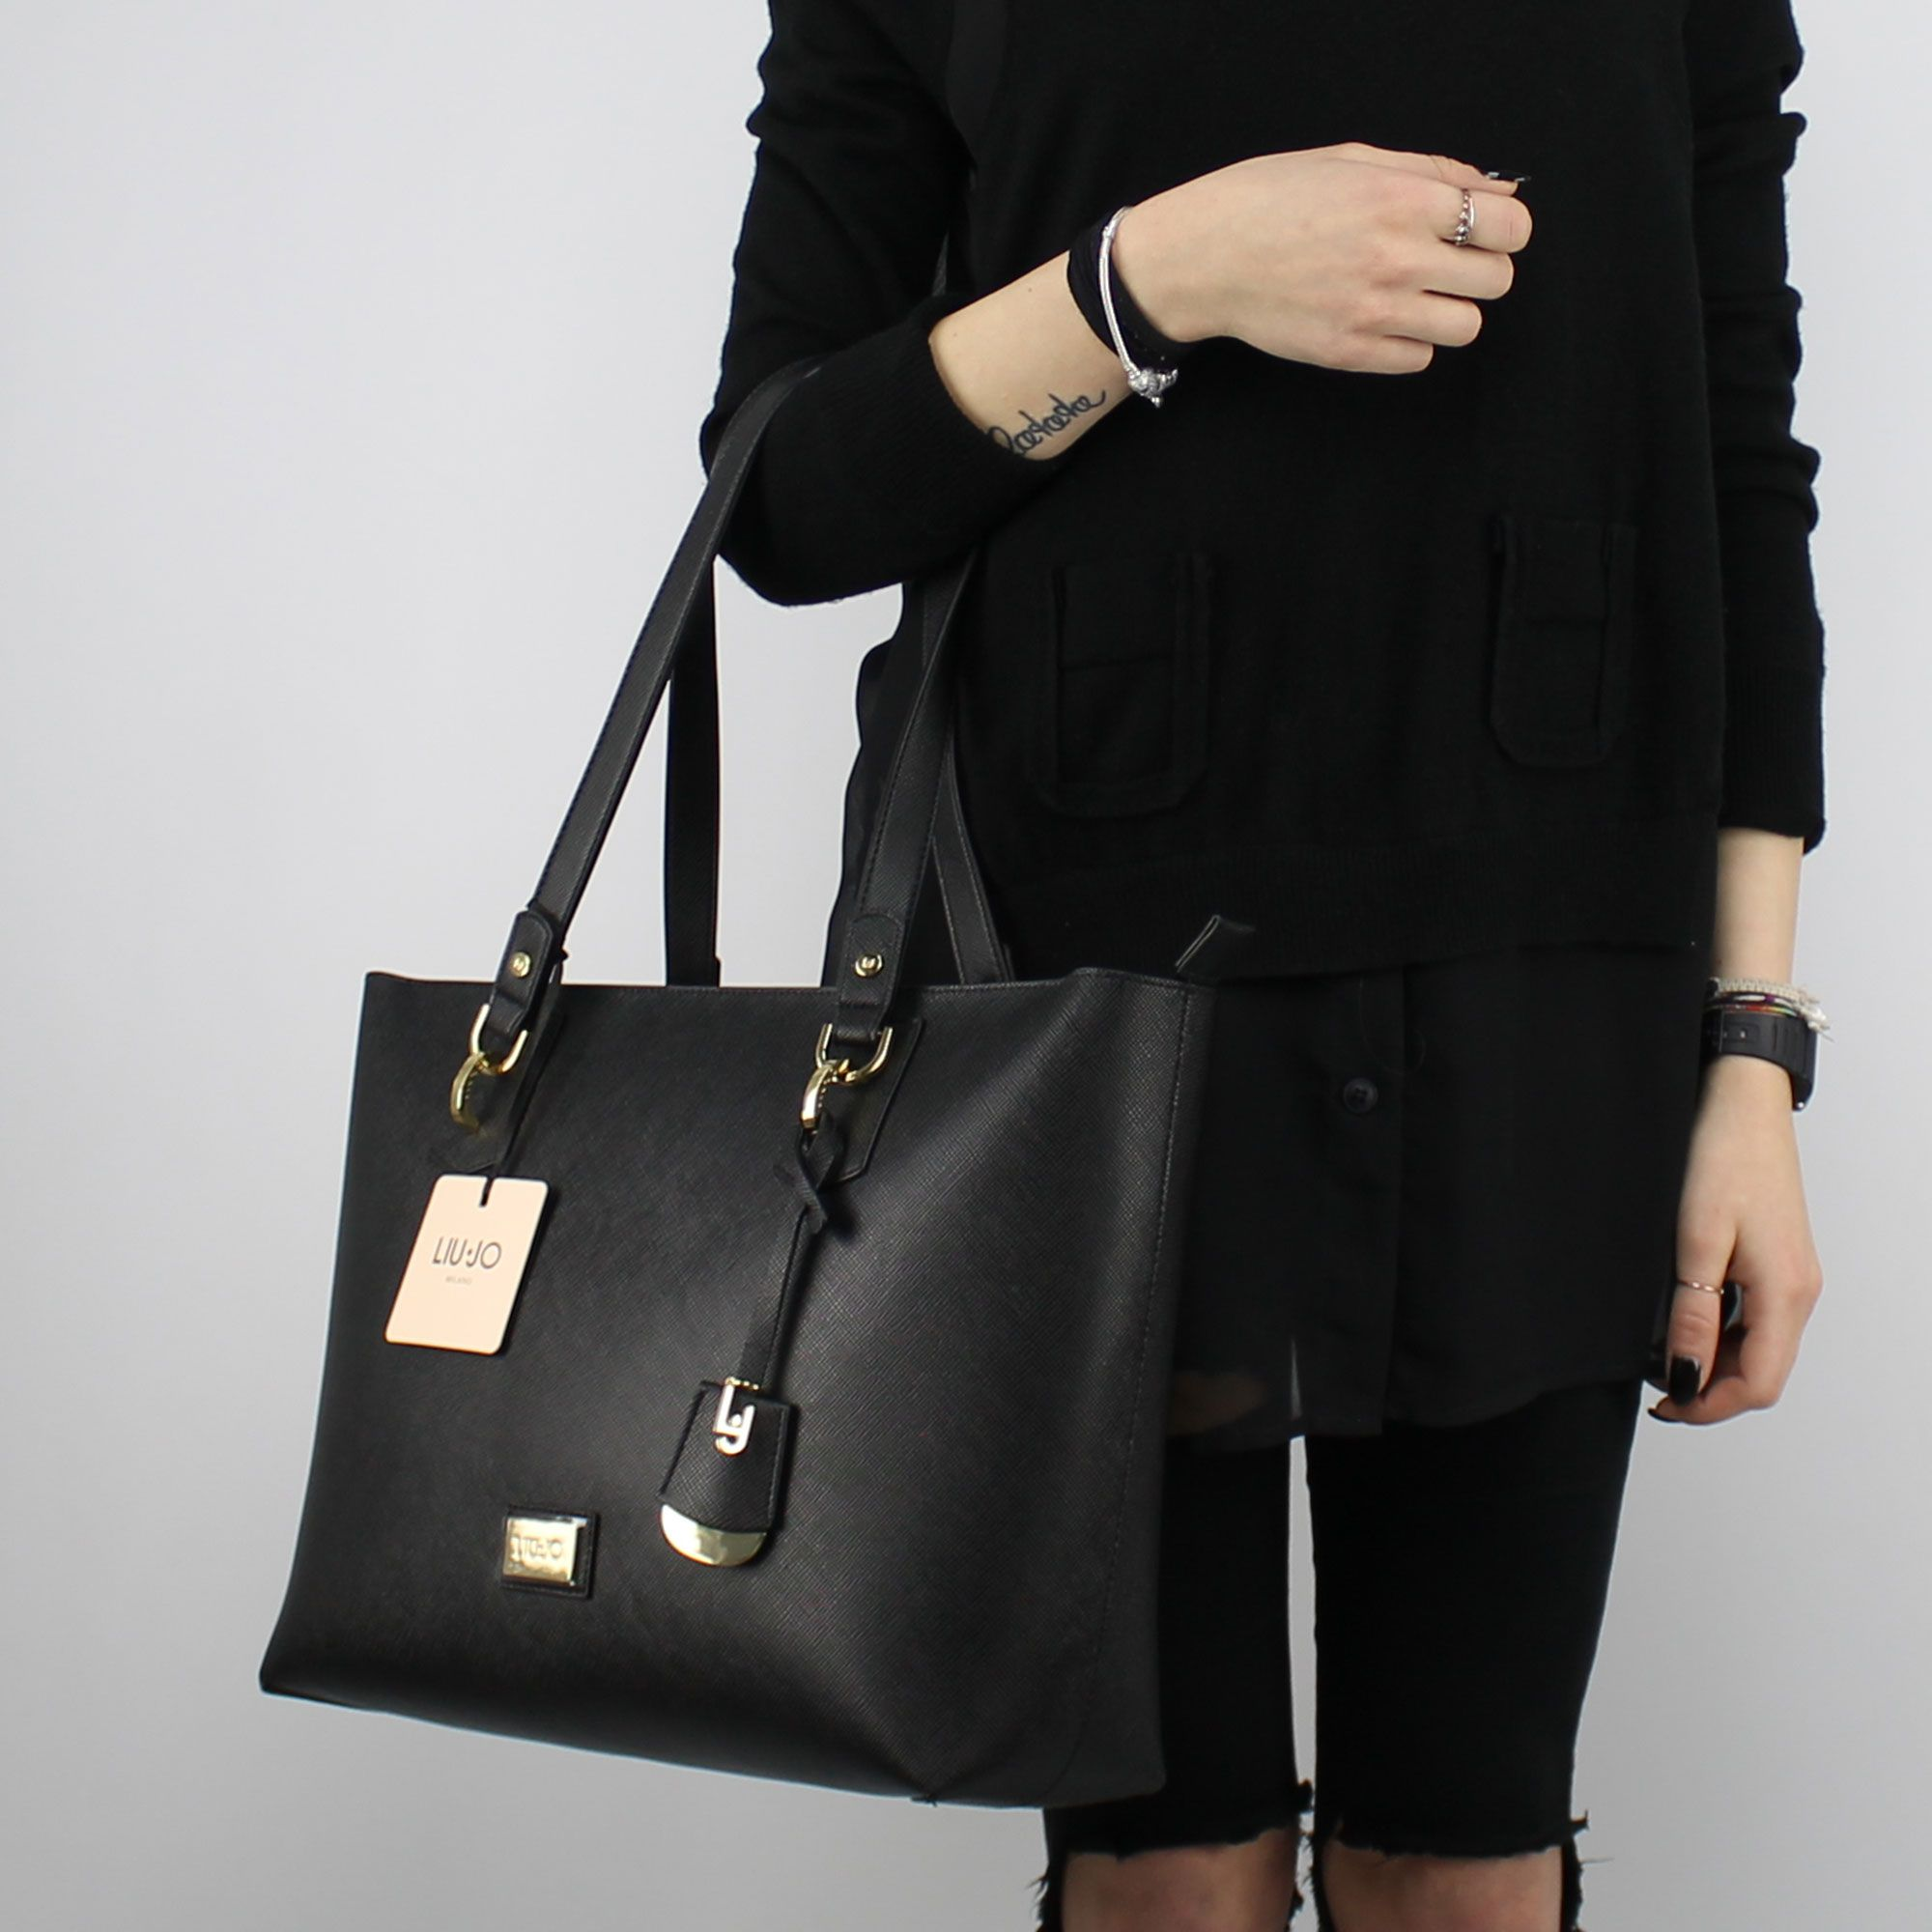 Shopping bag Liu Jo Tote Hawaii black N18146 E0017 In More